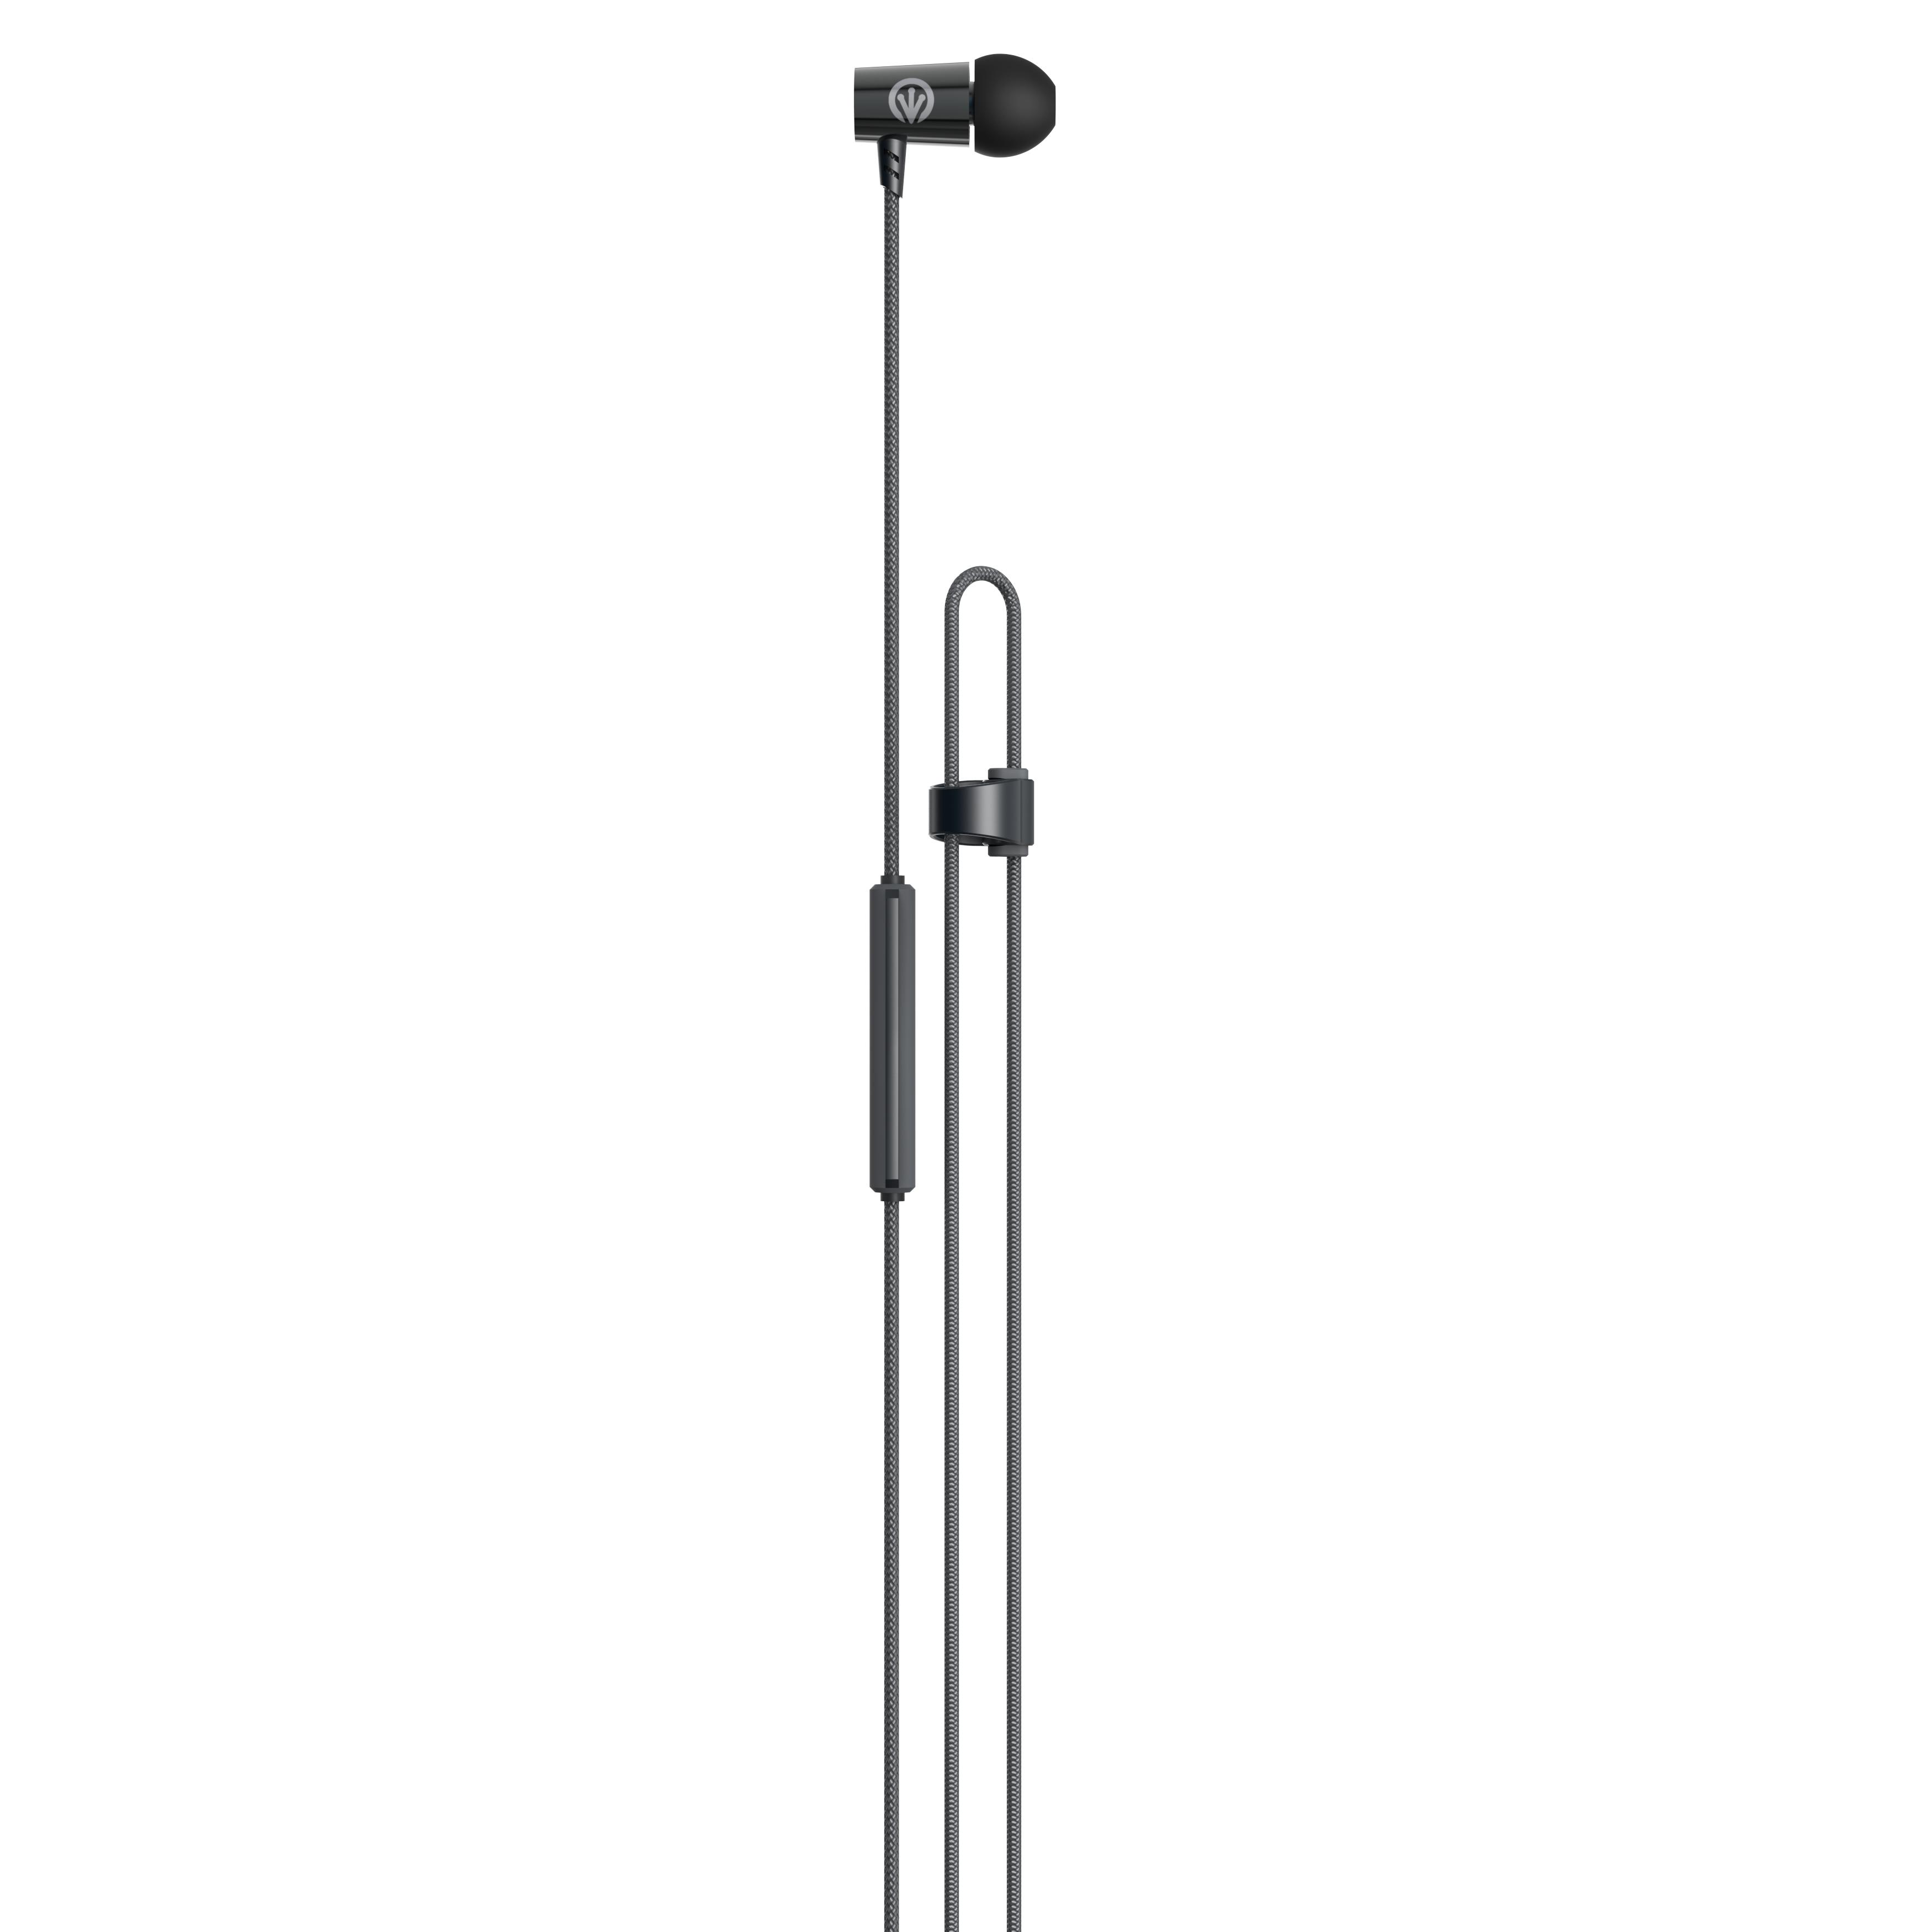 iFrogz Luxe air im Ohr Binaural Verkabelt Schwarz - Grau Mobiles Headset